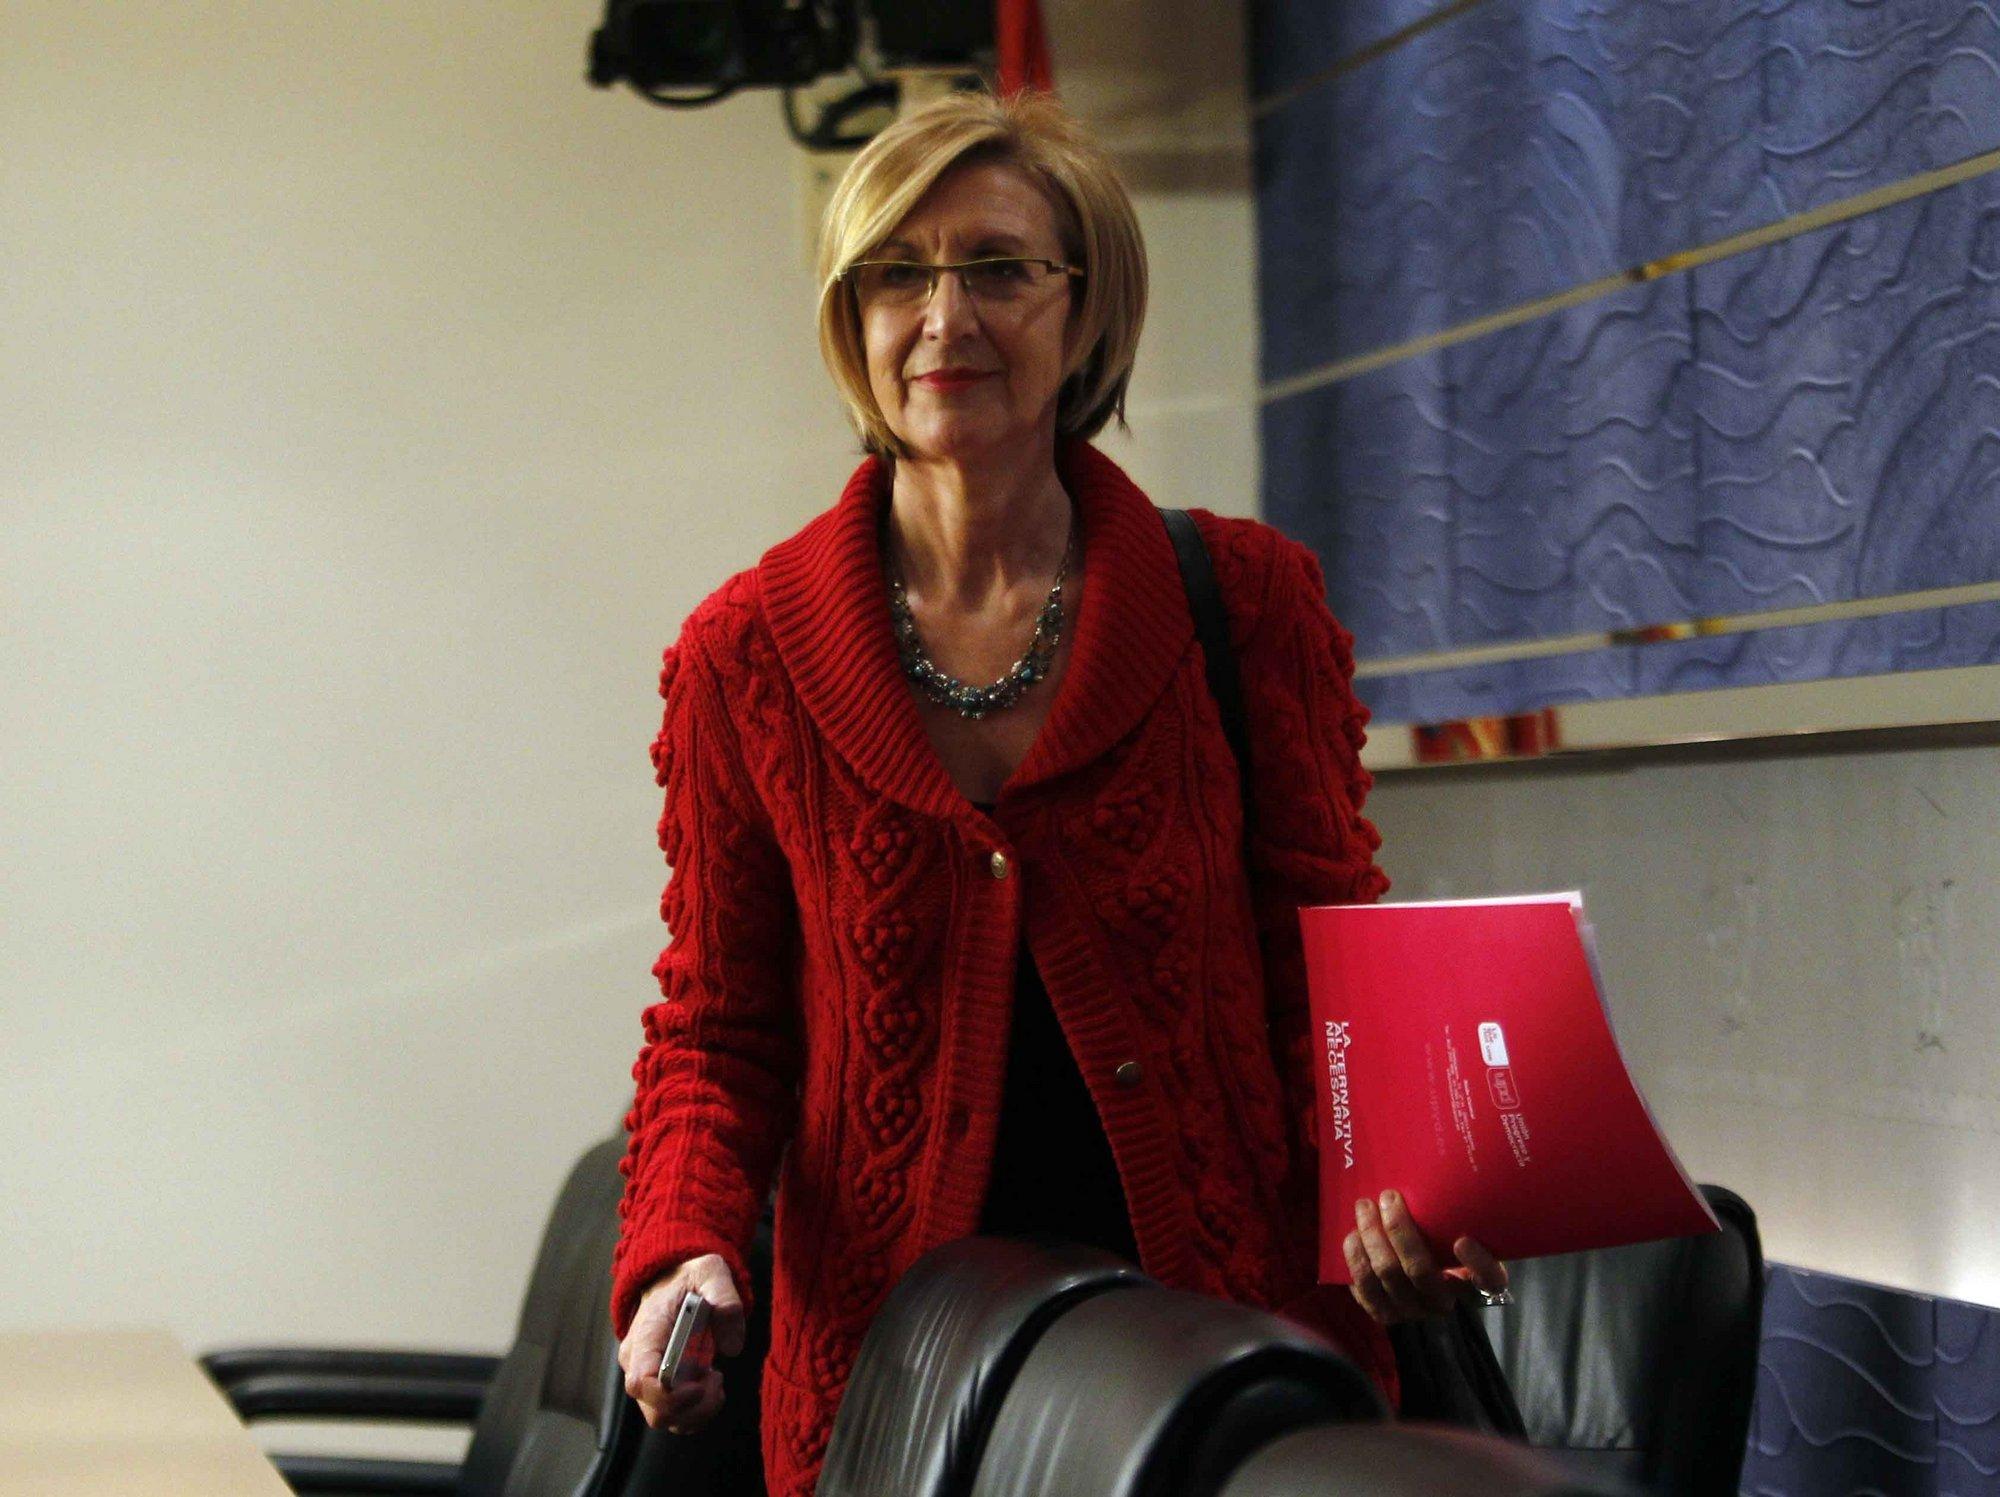 CiU e IU-ICV-CHA confirman su firma al acuerdo PP-PSOE sobre ETA por su «valor constructivo»